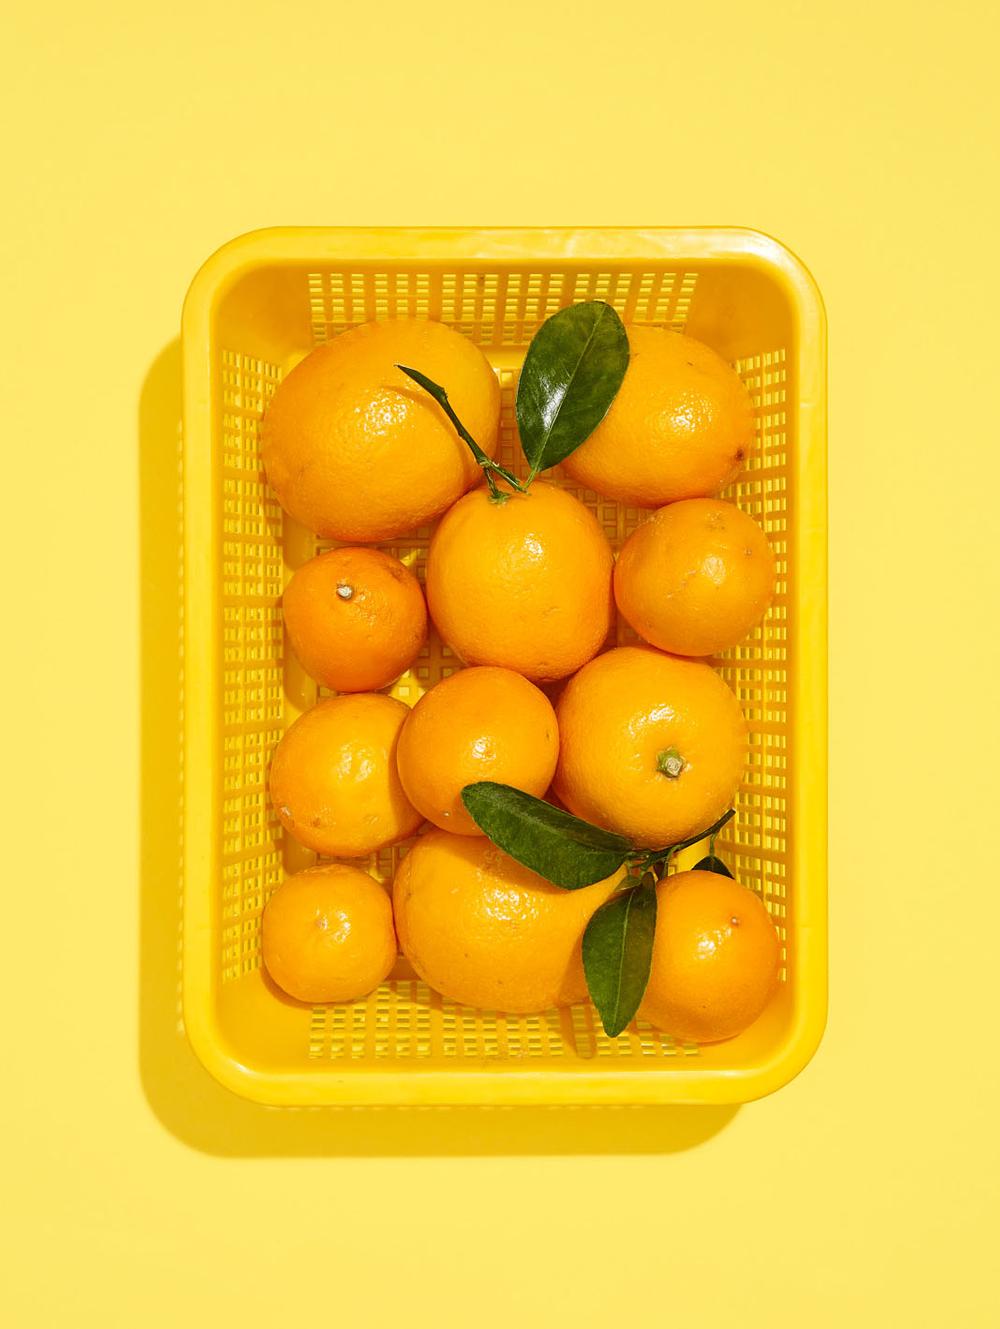 Yellow food photo